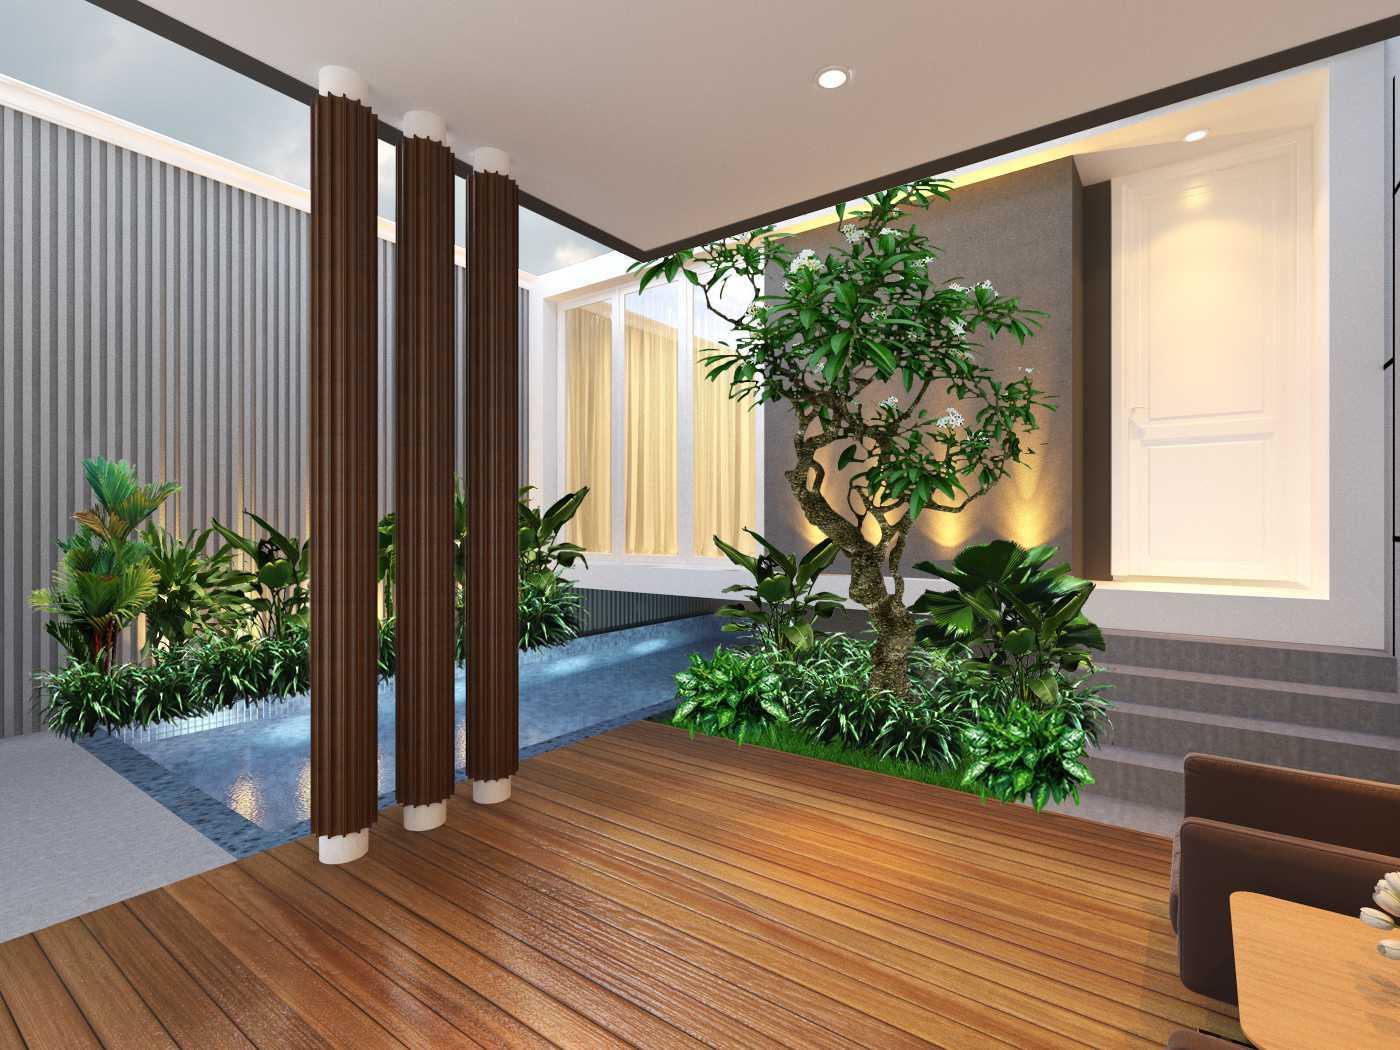 Sense Studio Residence - Surabaya Surabaya, Kota Sby, Jawa Timur, Indonesia Surabaya, Kota Sby, Jawa Timur, Indonesia Sense-Studio-Rumah-Tinggal-Kertomenanggal  51653